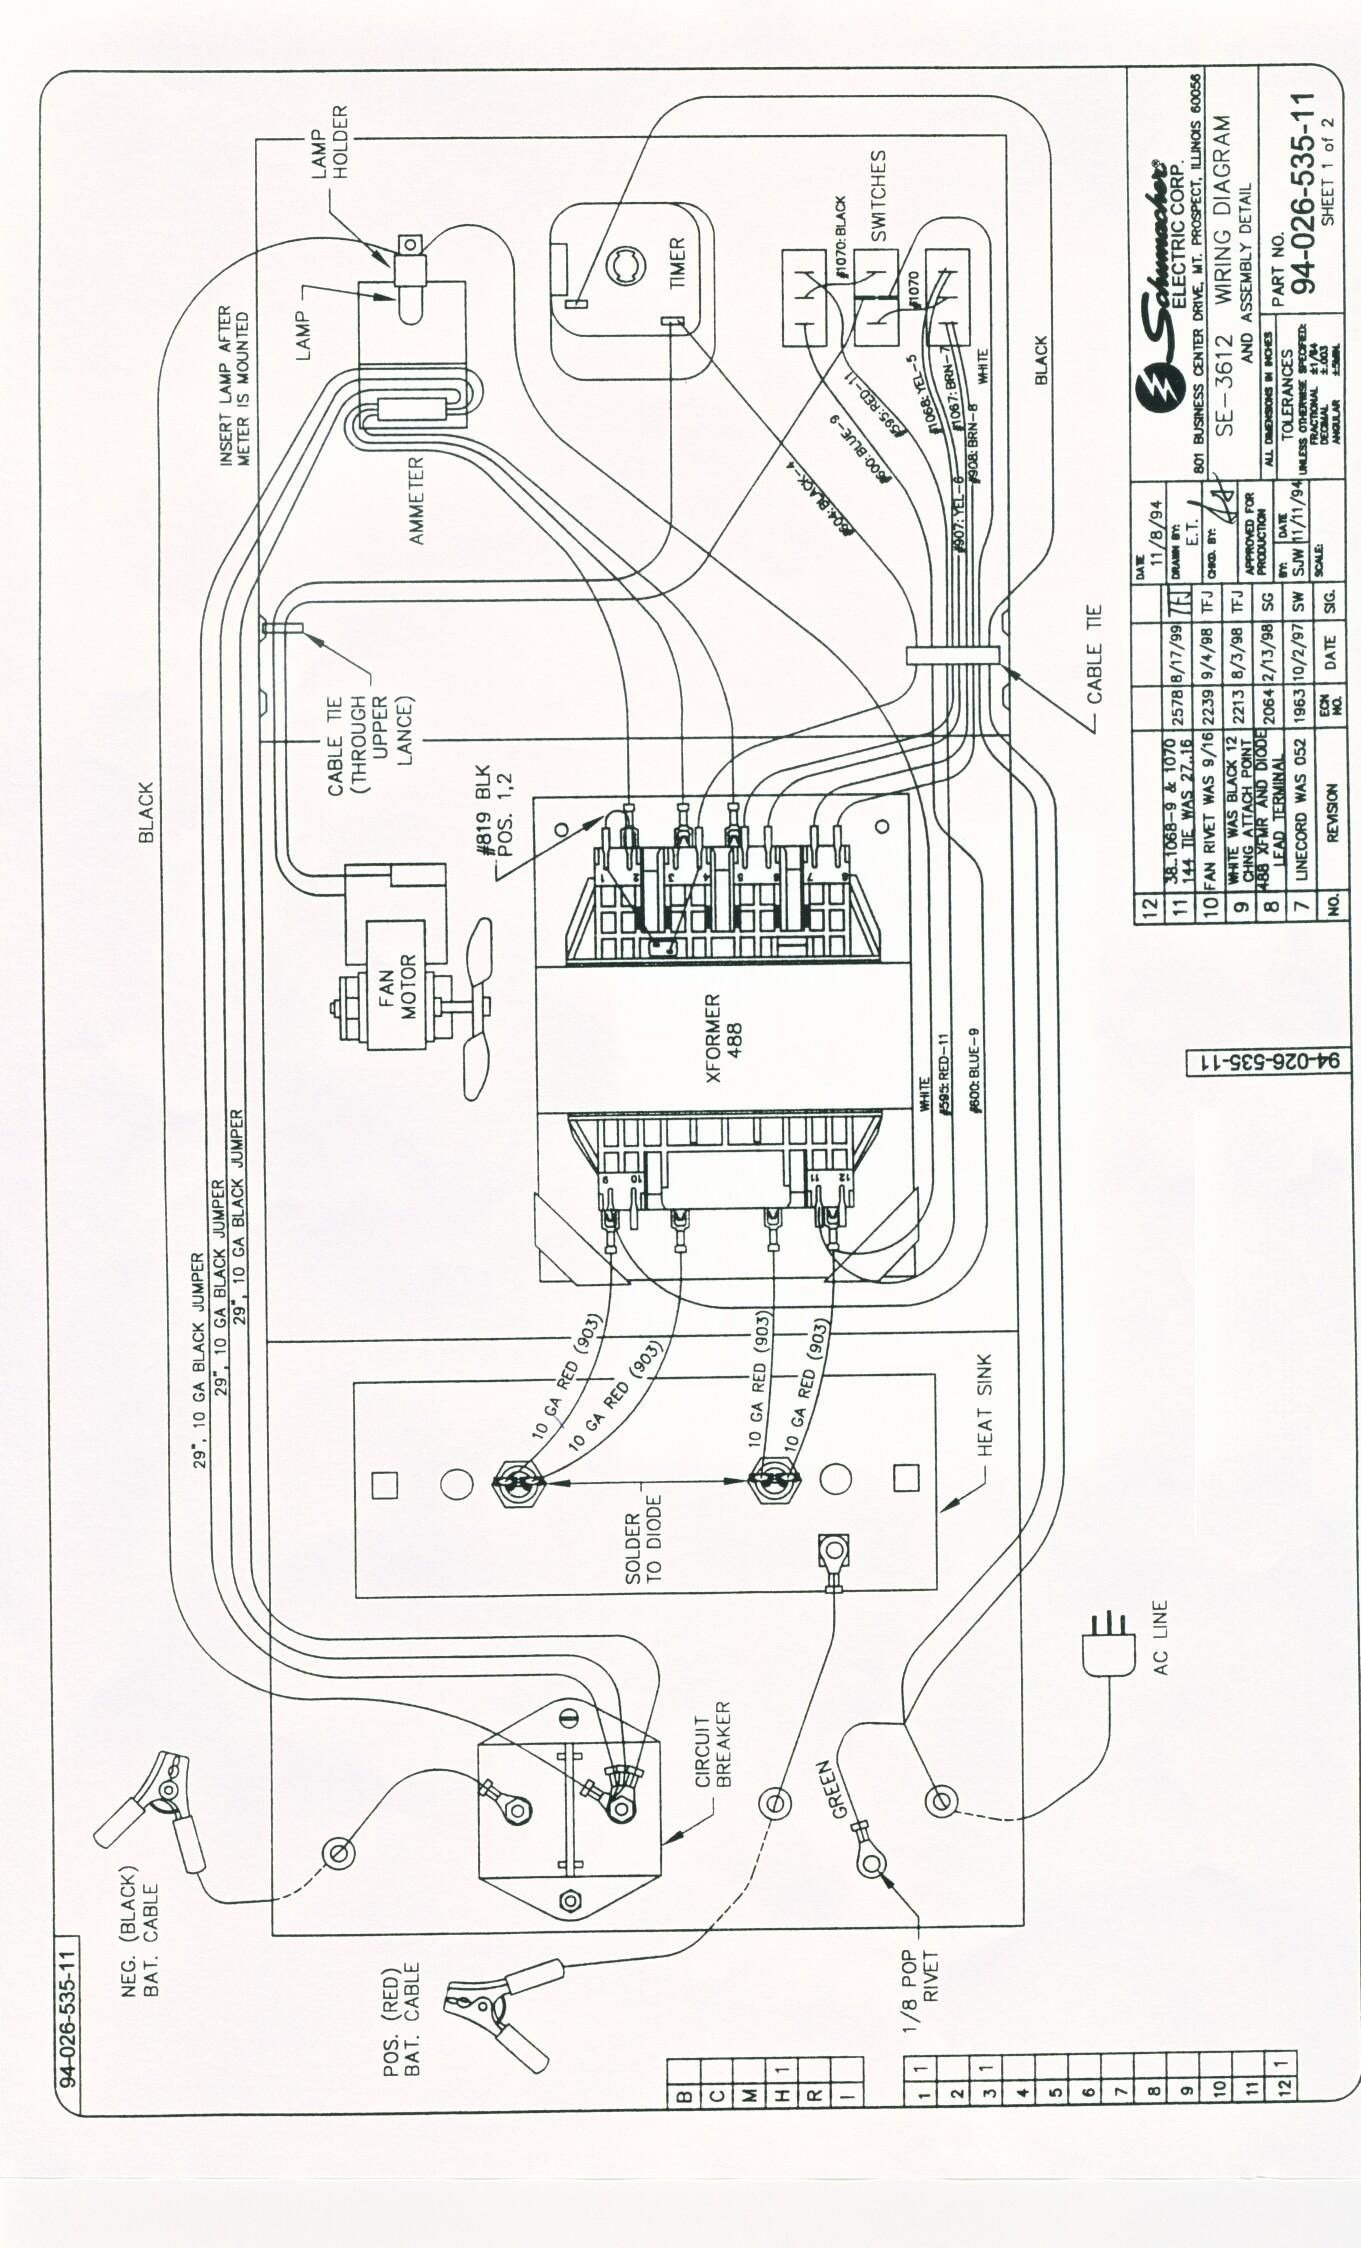 Fine schumacher 4020 battery charger wiring diagram adornment rh thetada cbr 600 f3 fuel pump